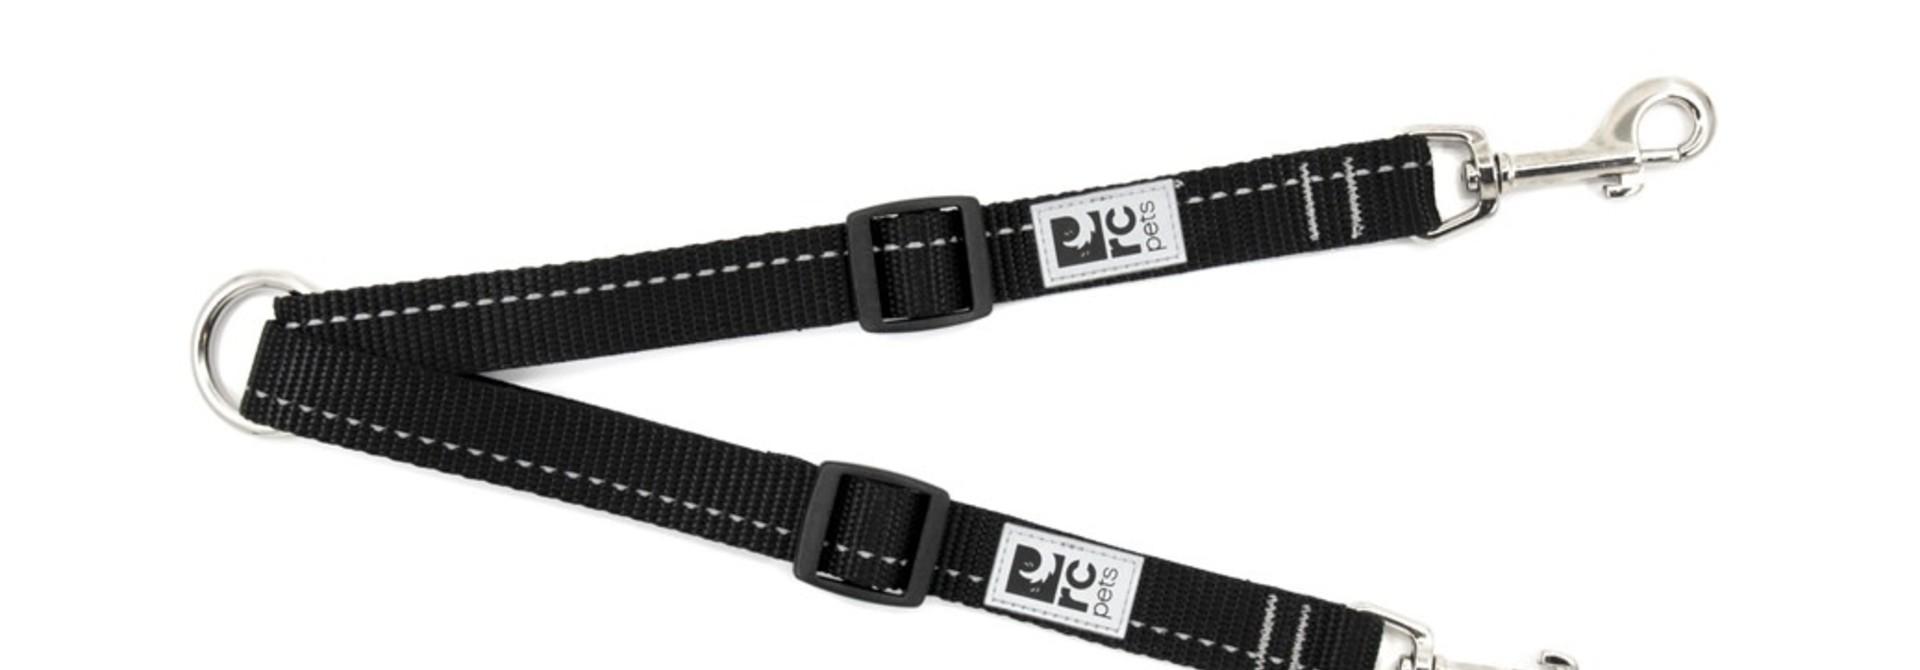 Adjustable Coupler Primary XS 1/2 Black